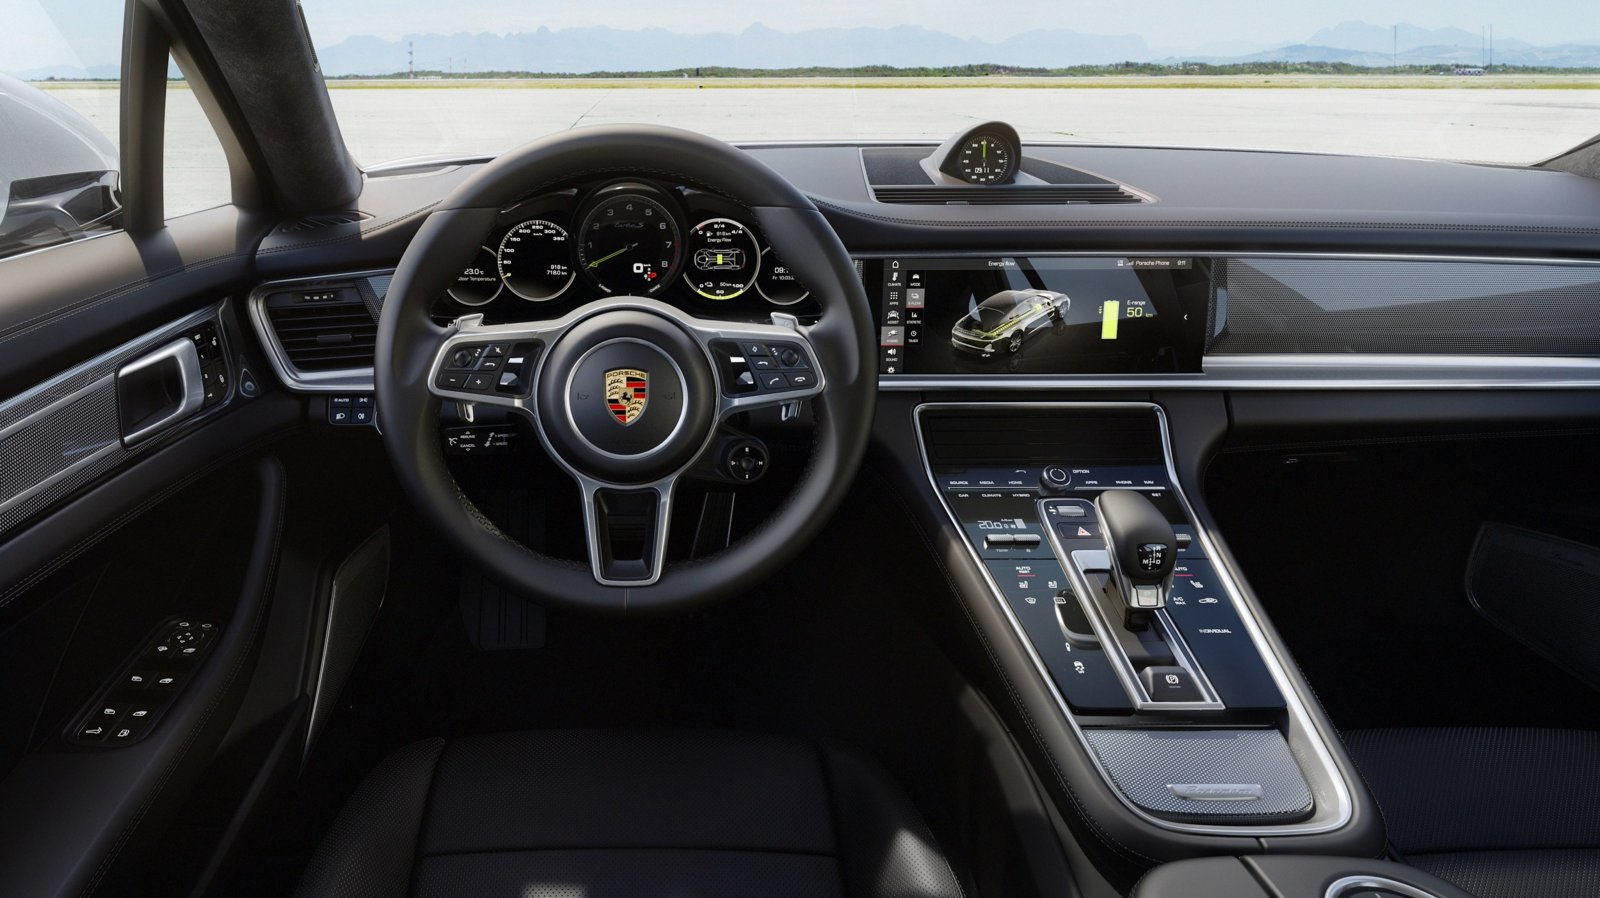 panamera-turbo-s-e-hybrid-4-1.jpg